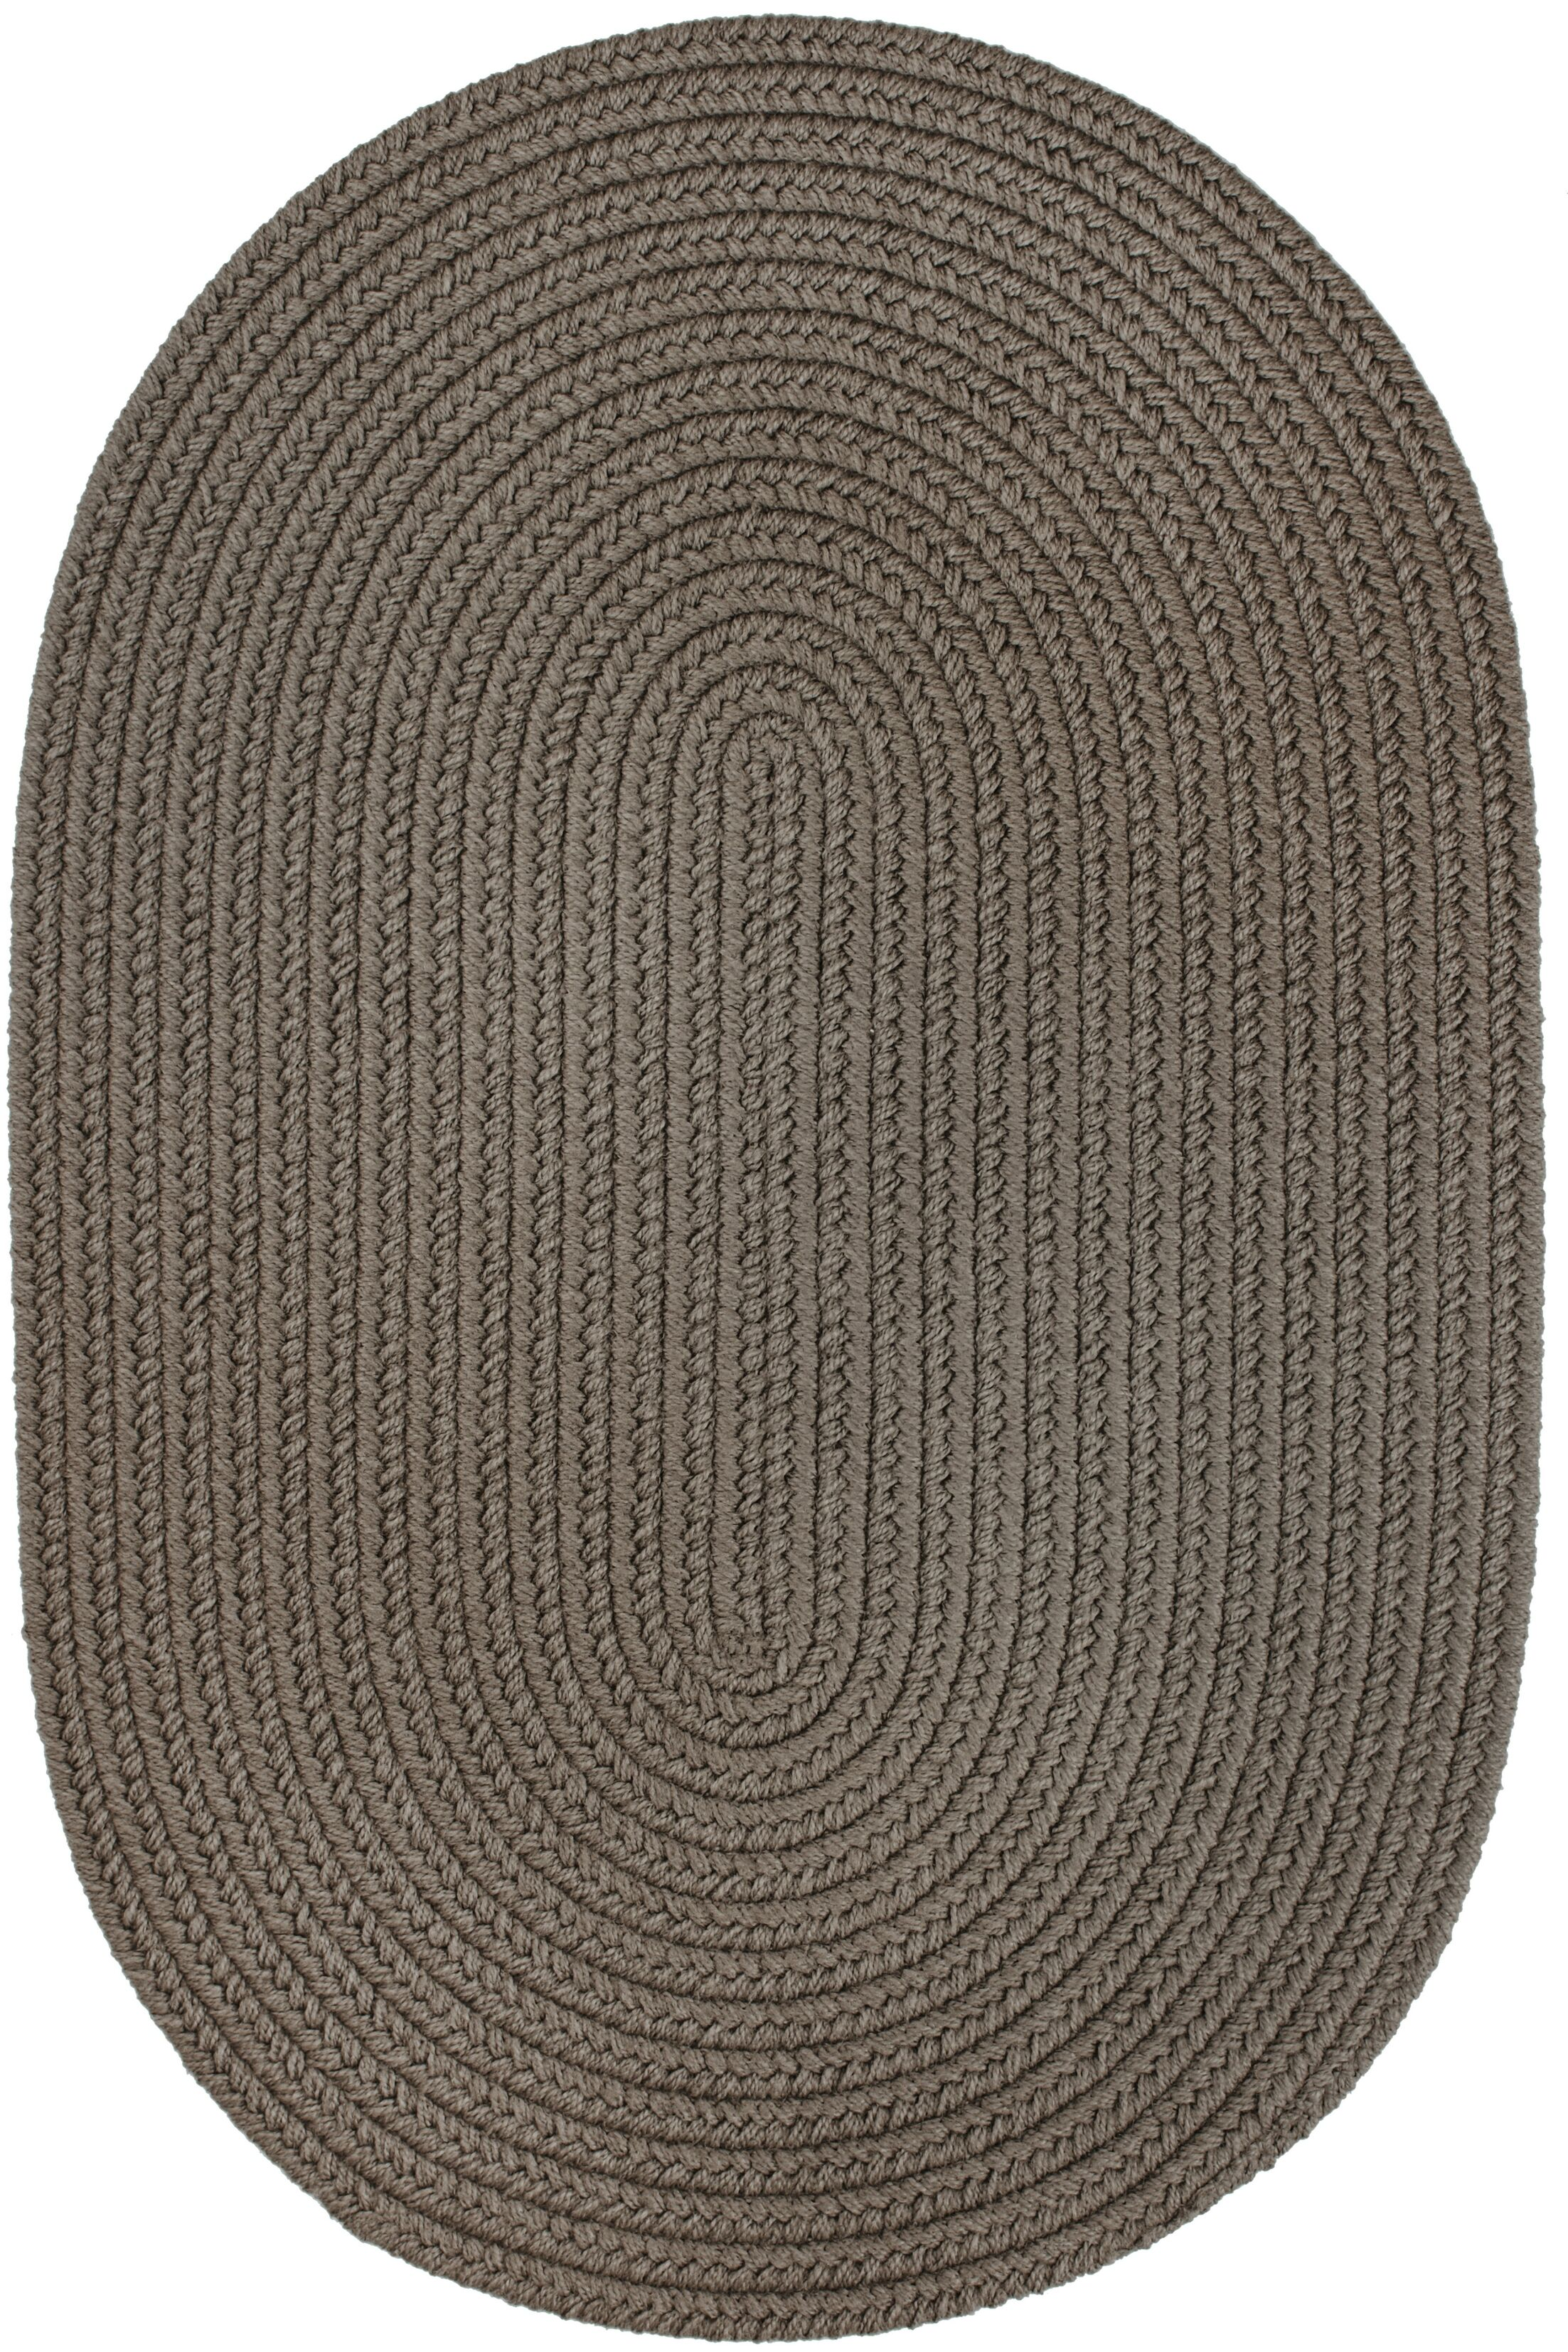 Handmade Gray Indoor/Outdoor Area Rug Rug Size: Oval 10' x 13'